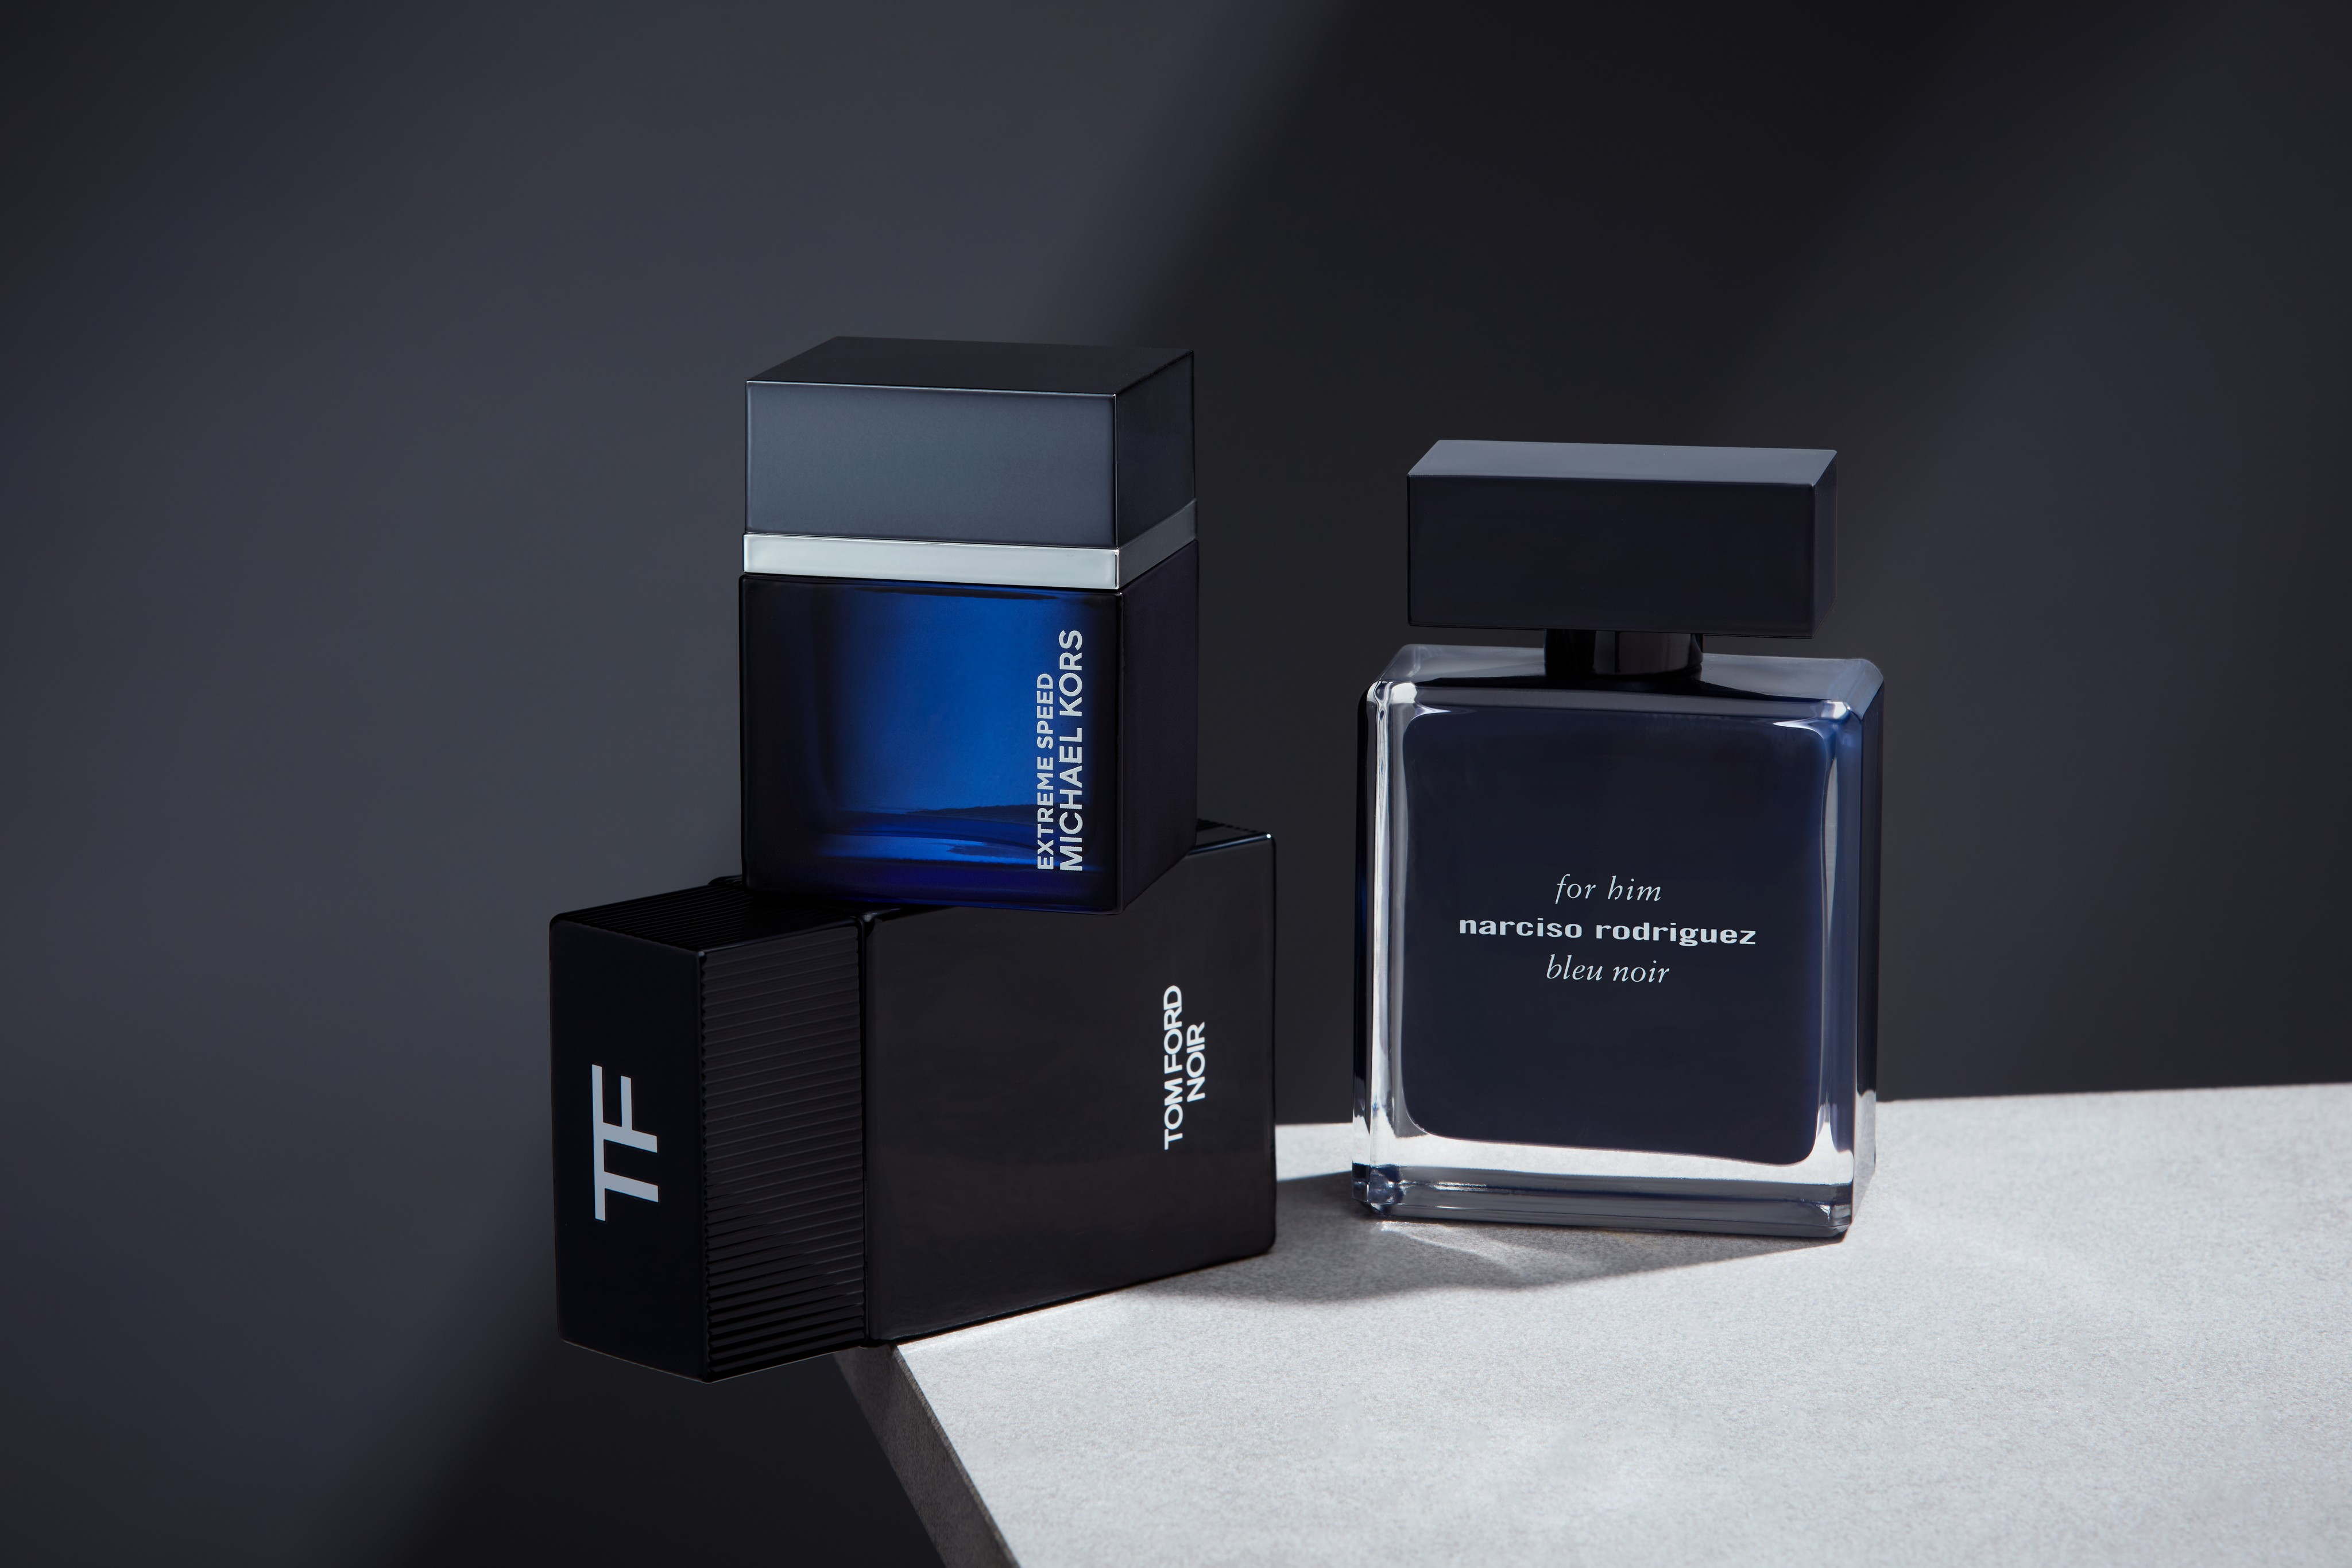 Skincare-product-men-beauty-stone-edge-tomford-michaelkors-narcisorodriguez-unlimited-Web-Rendition